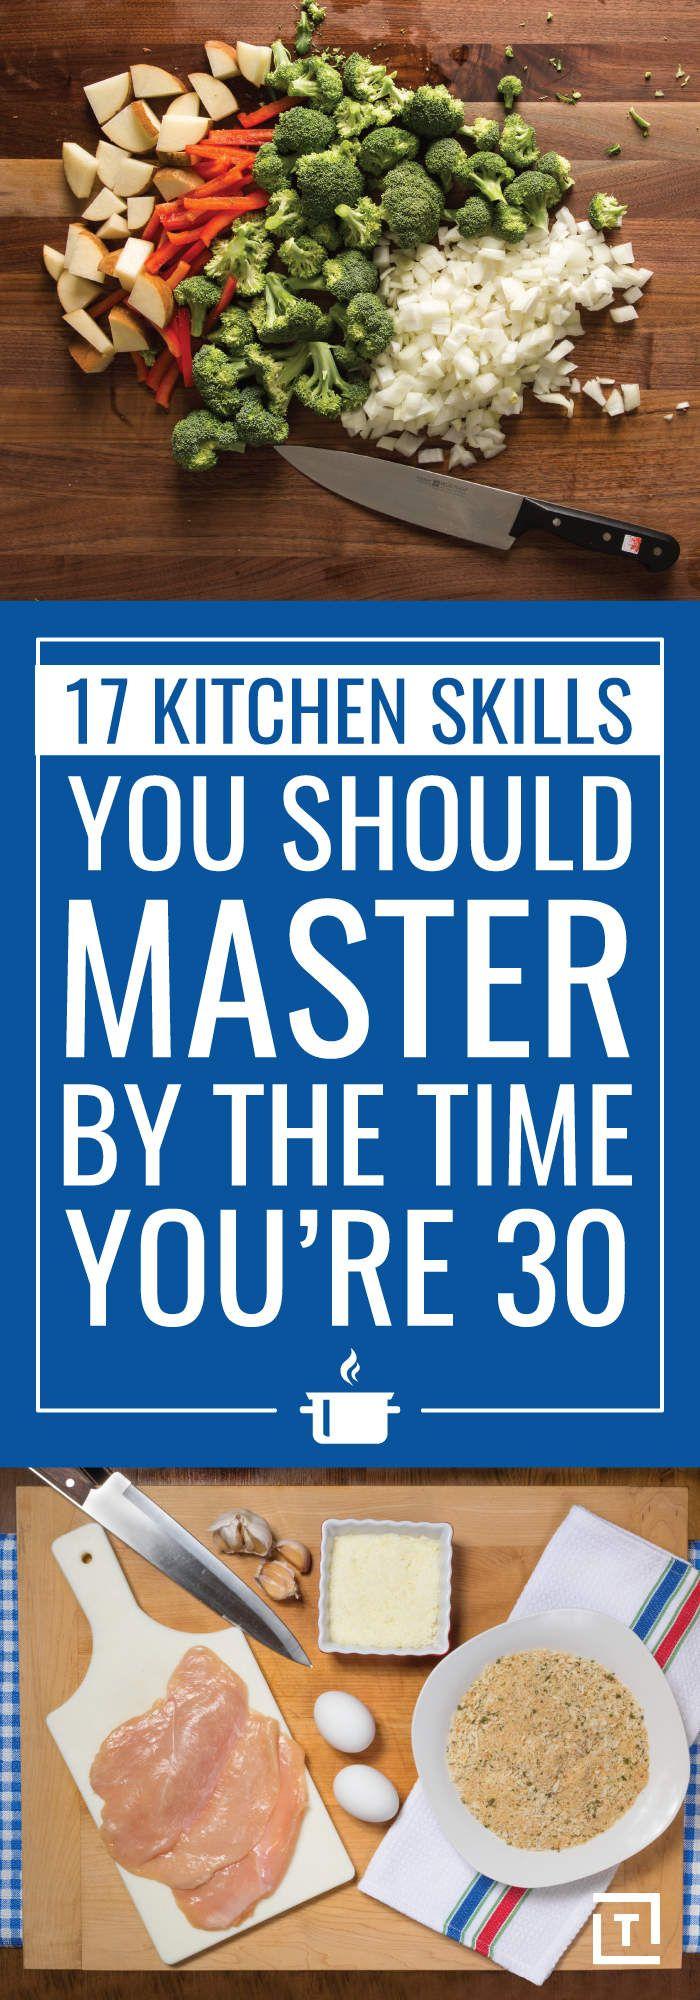 315 best KITCHEN TIPS & IDEAS images on Pinterest   Kitchen hacks ...